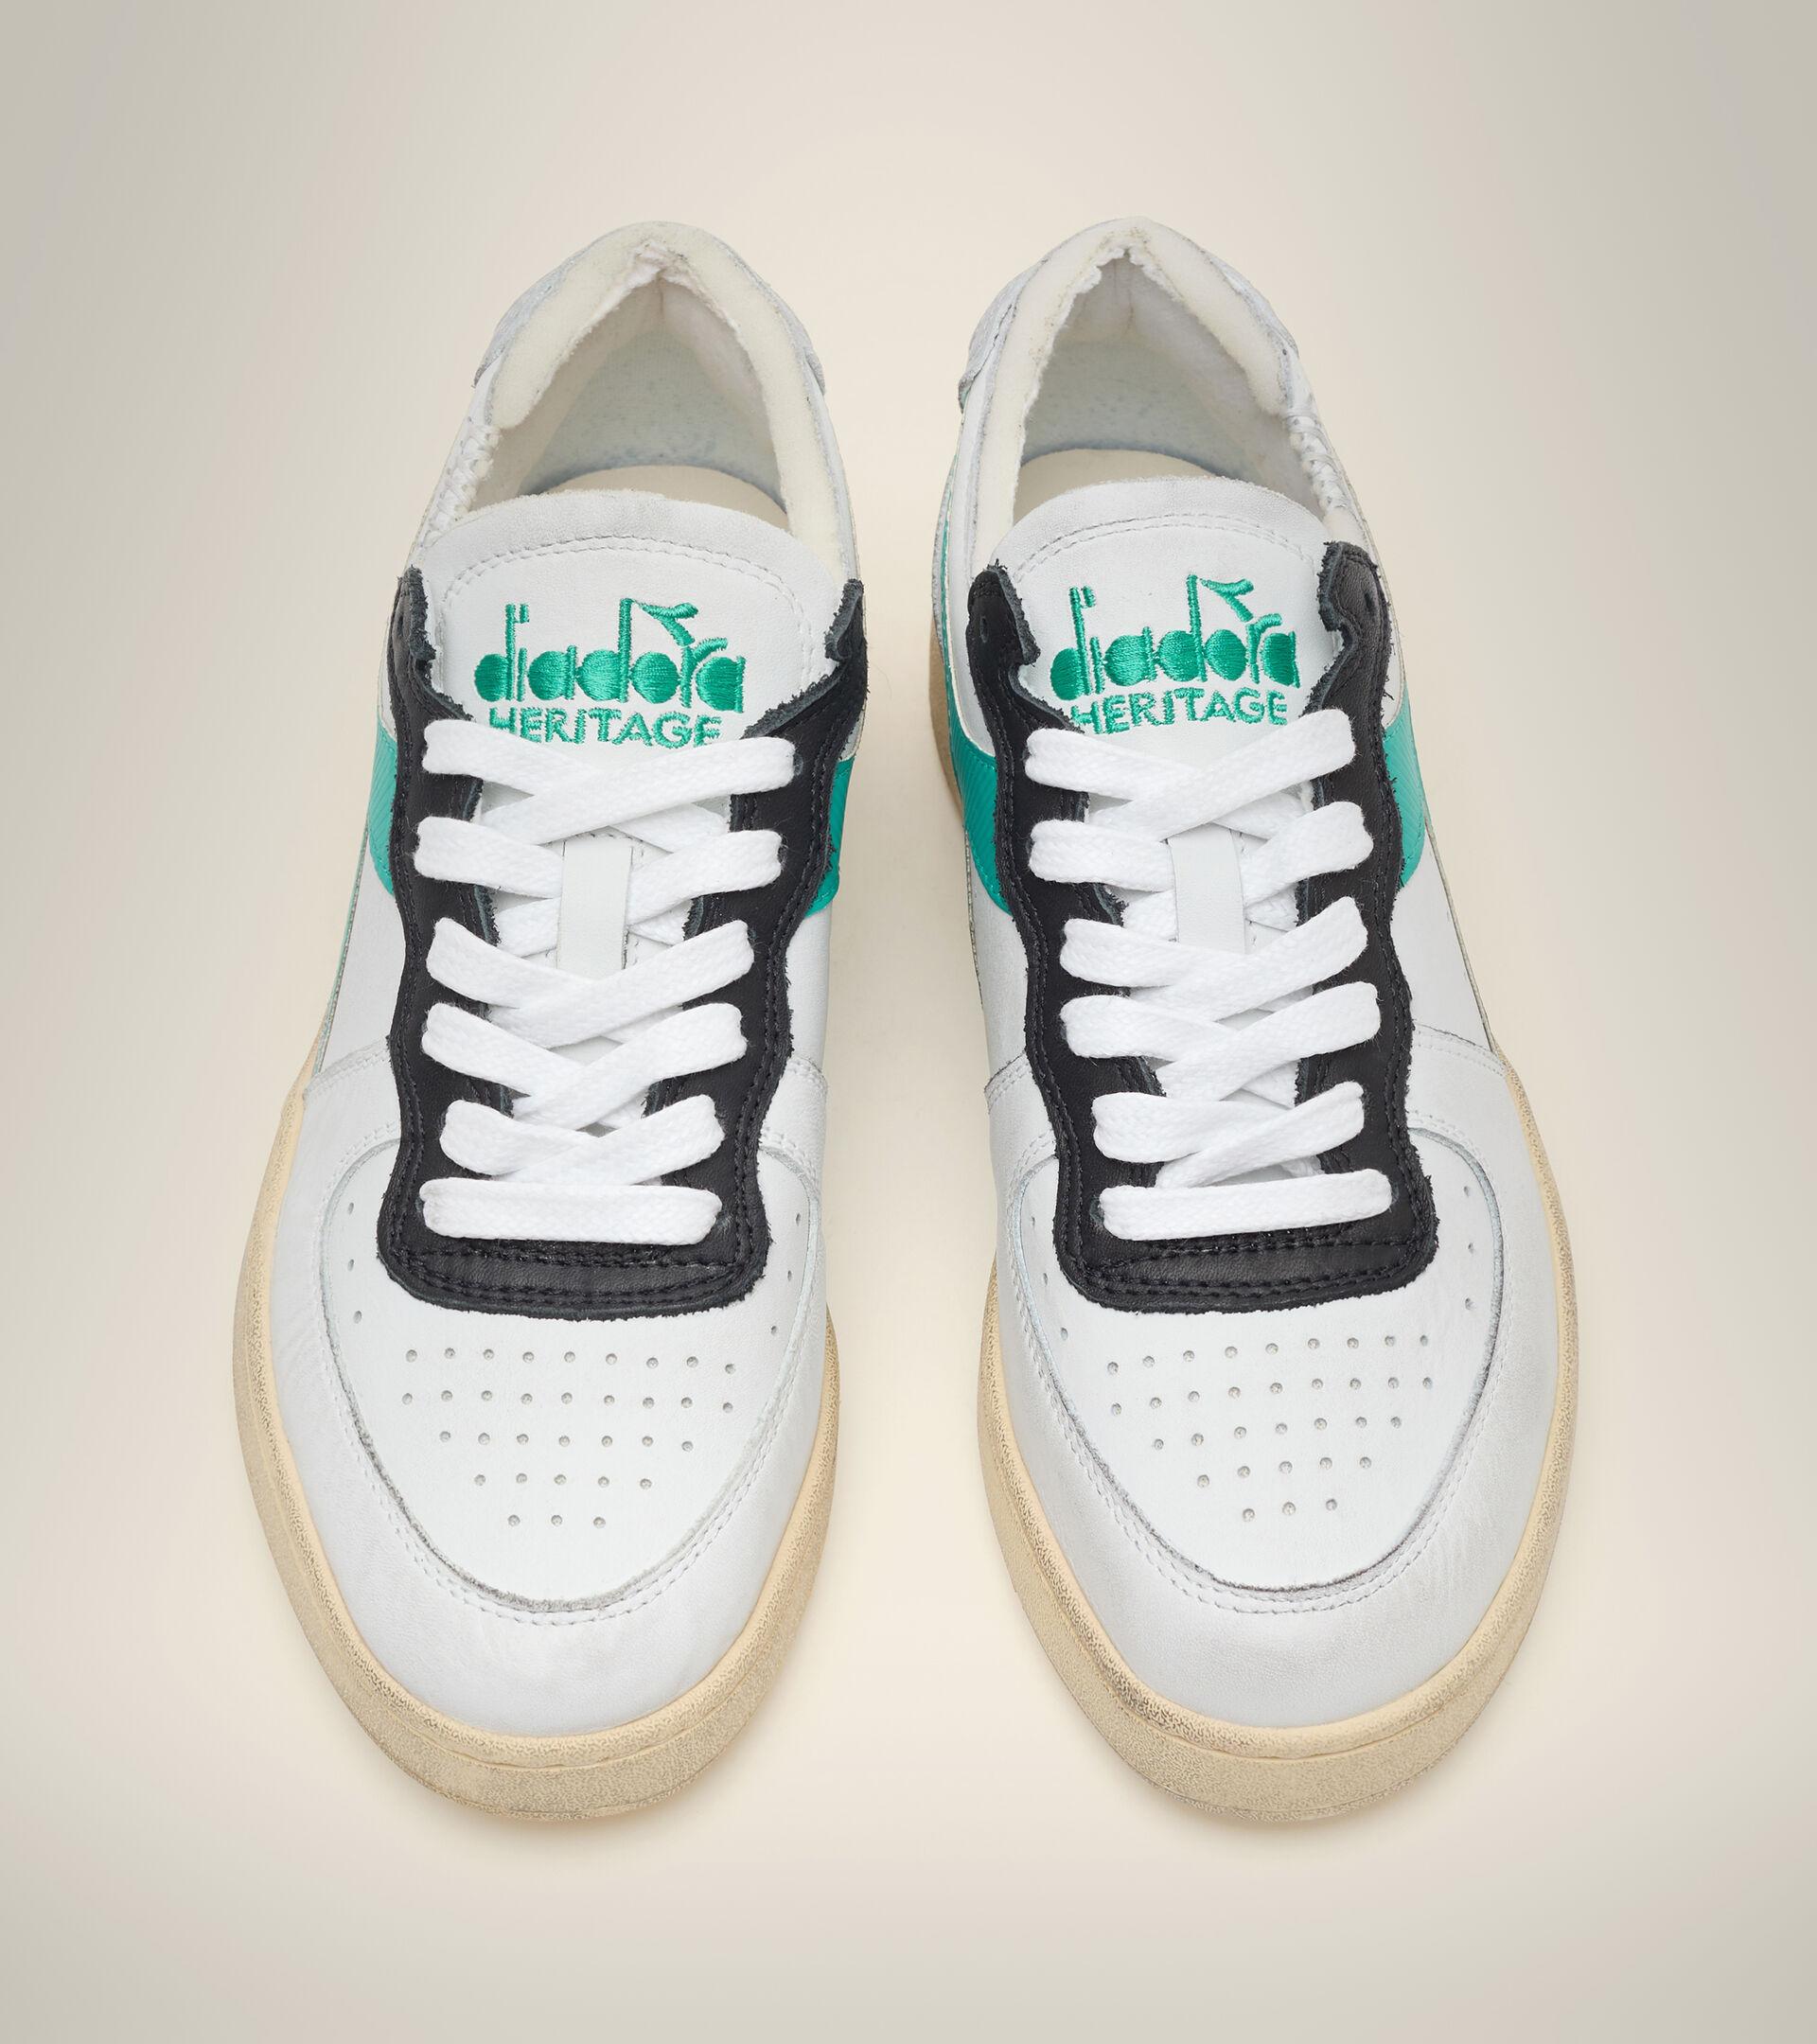 Footwear Heritage UNISEX MI BASKET ROW CUT WHITE/HIGH RISE/PEACOCK GREEN Diadora